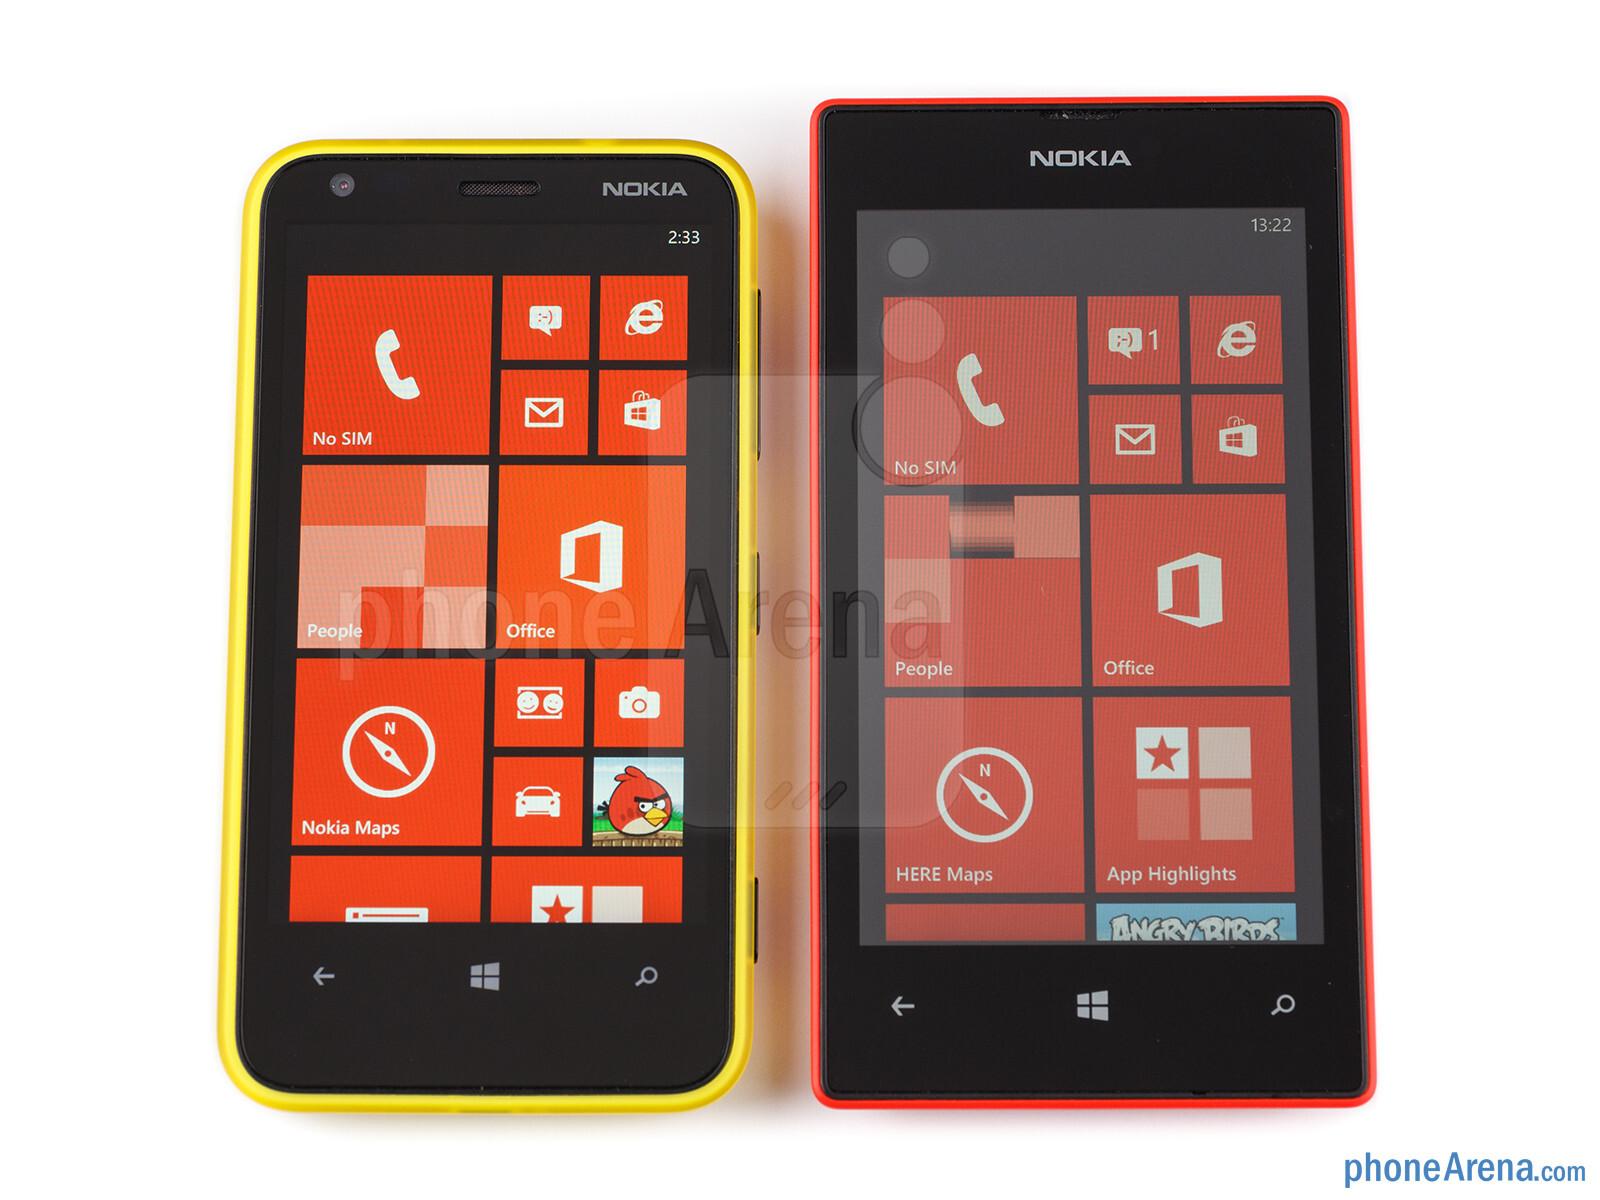 Nokia Lumia 520 vs Nokia Lumia 620Nokia Lumia 620 Vs 520